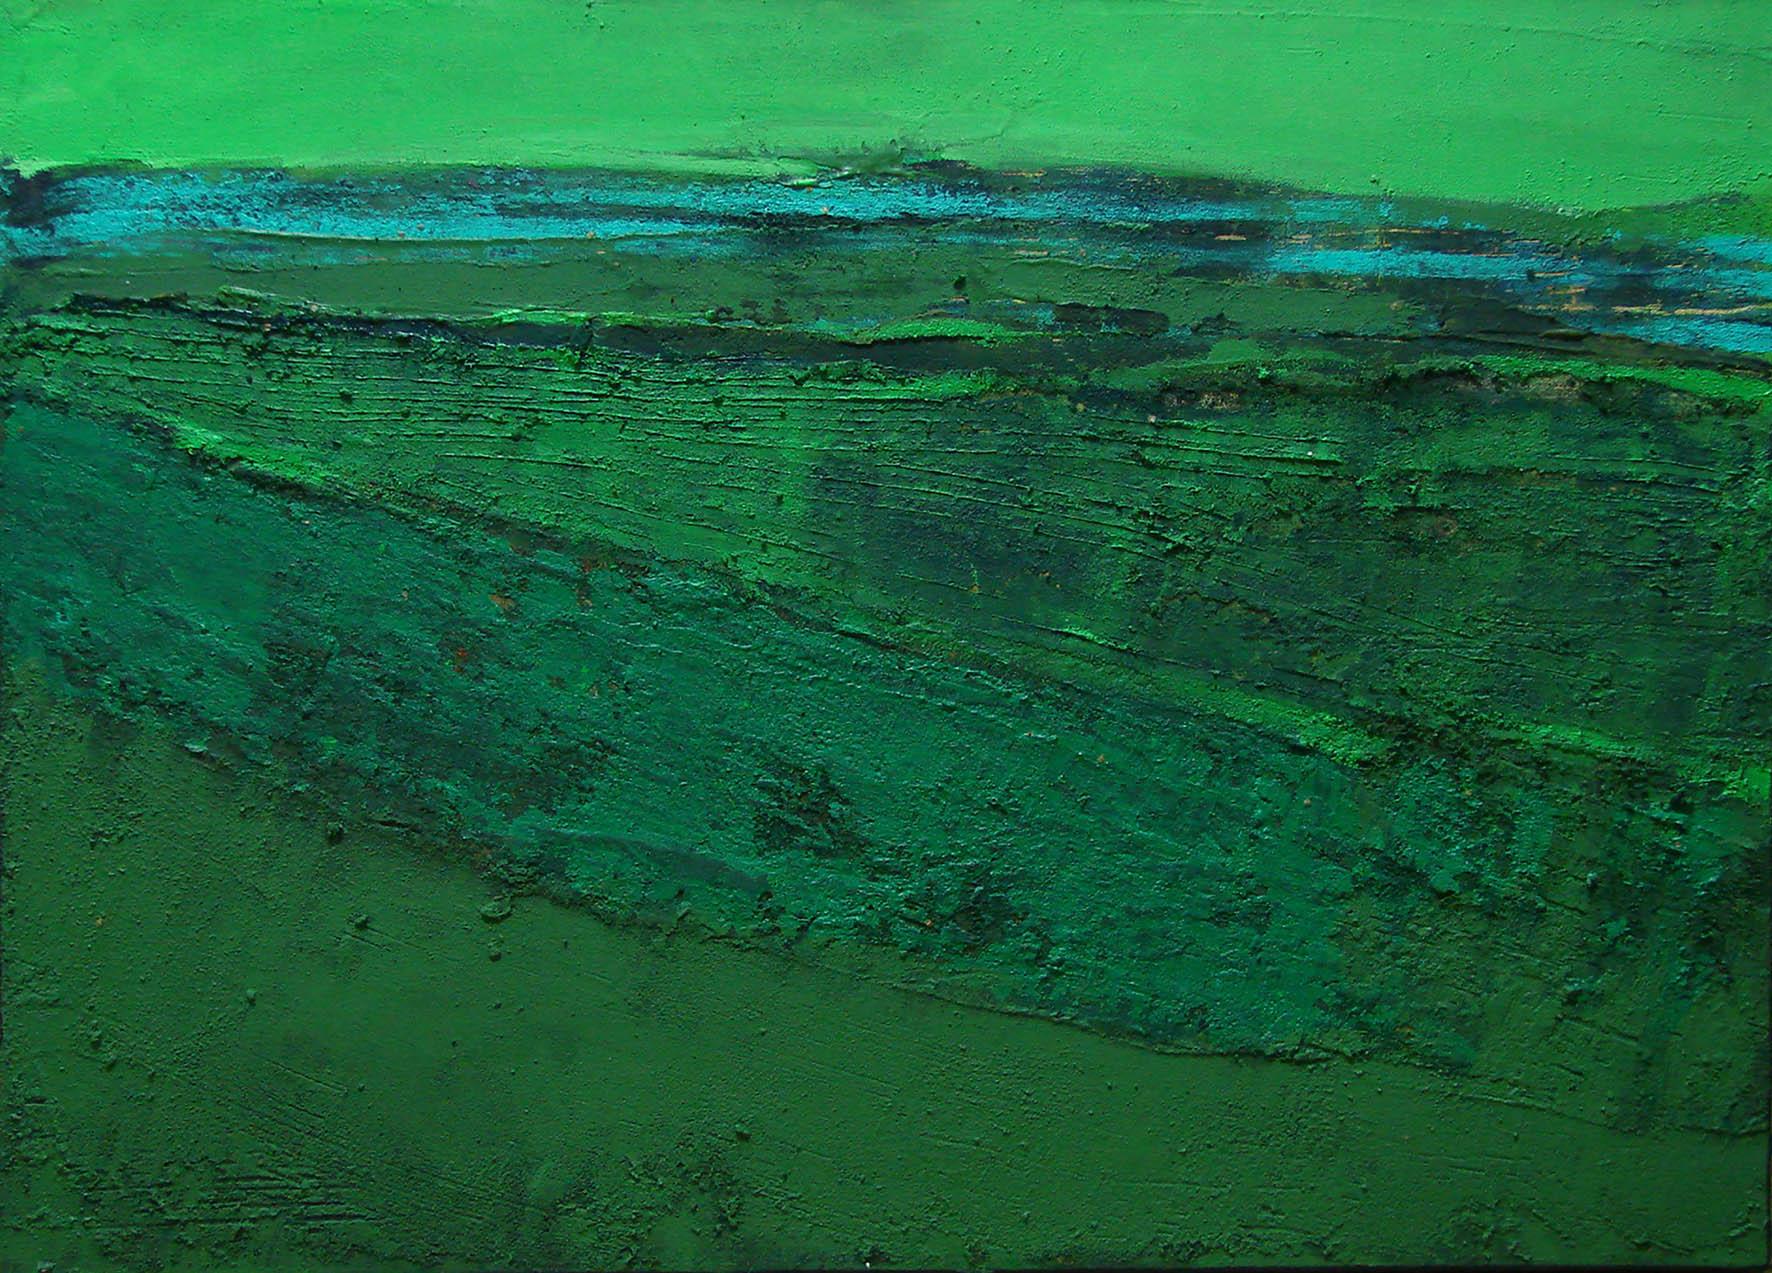 Zielona refleksja, 2016